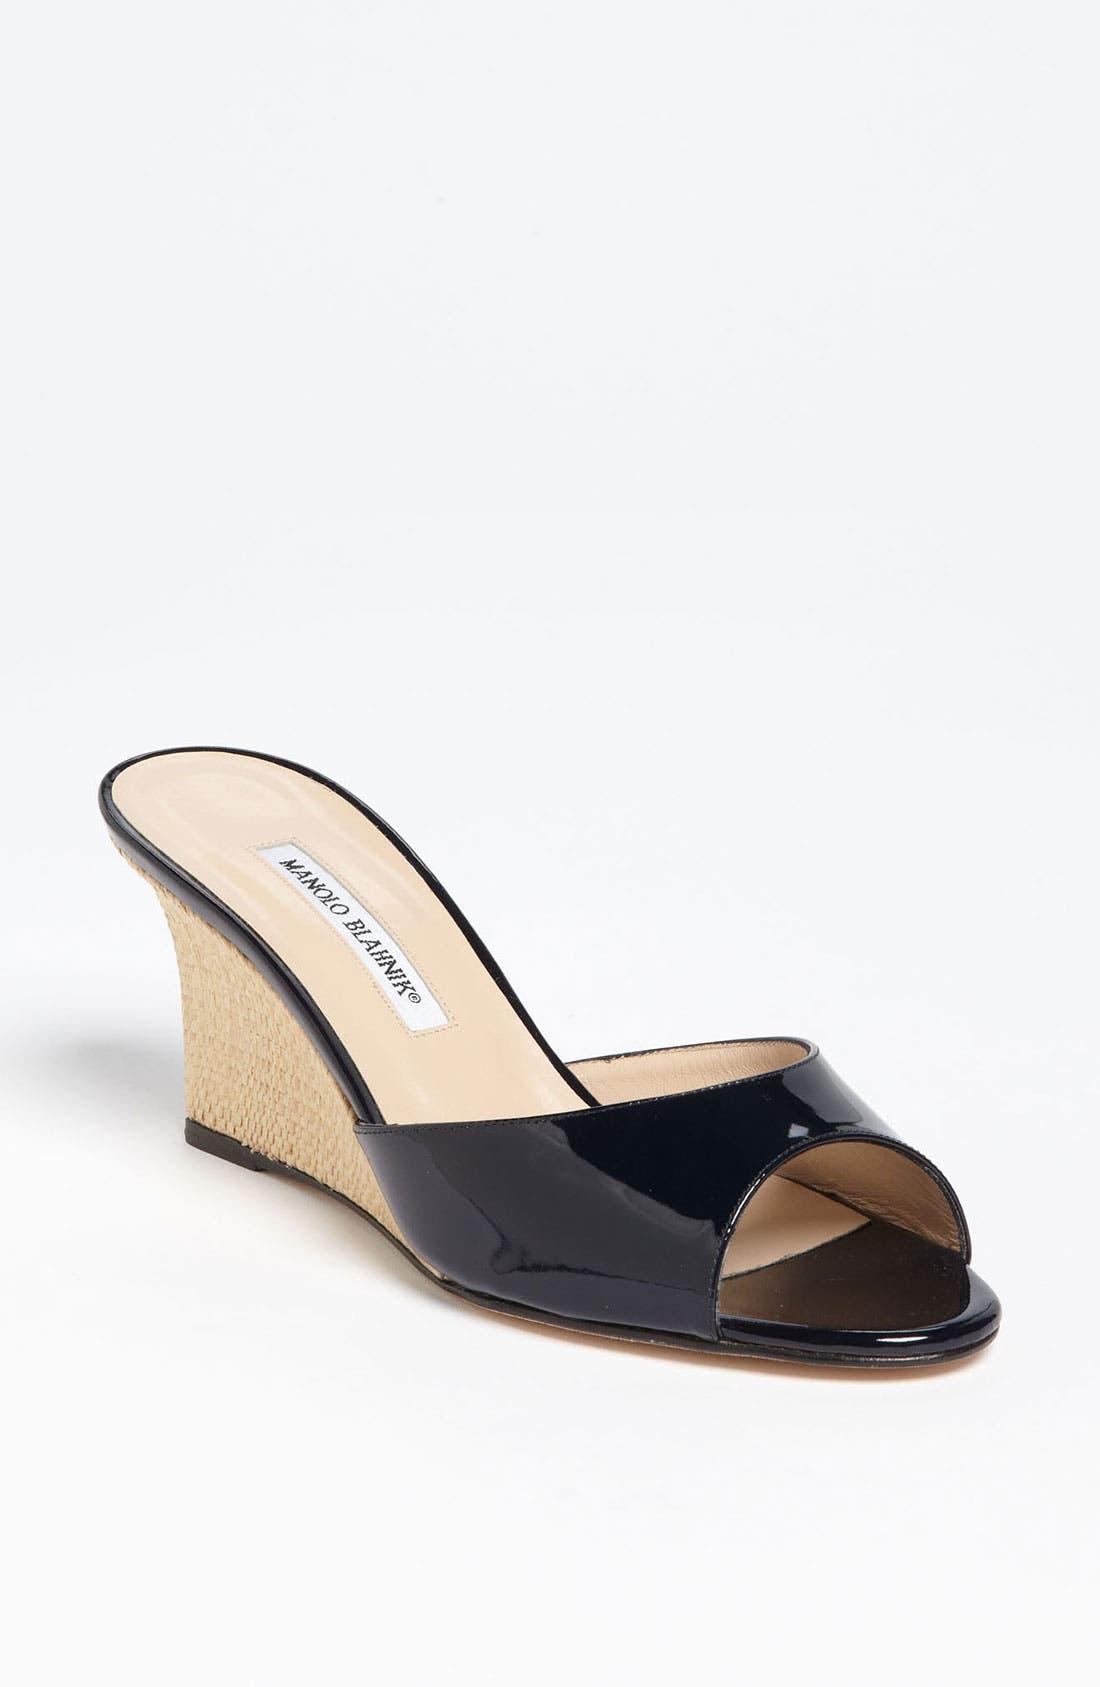 Main Image - Manolo Blahnik 'Falsonol' Sandal